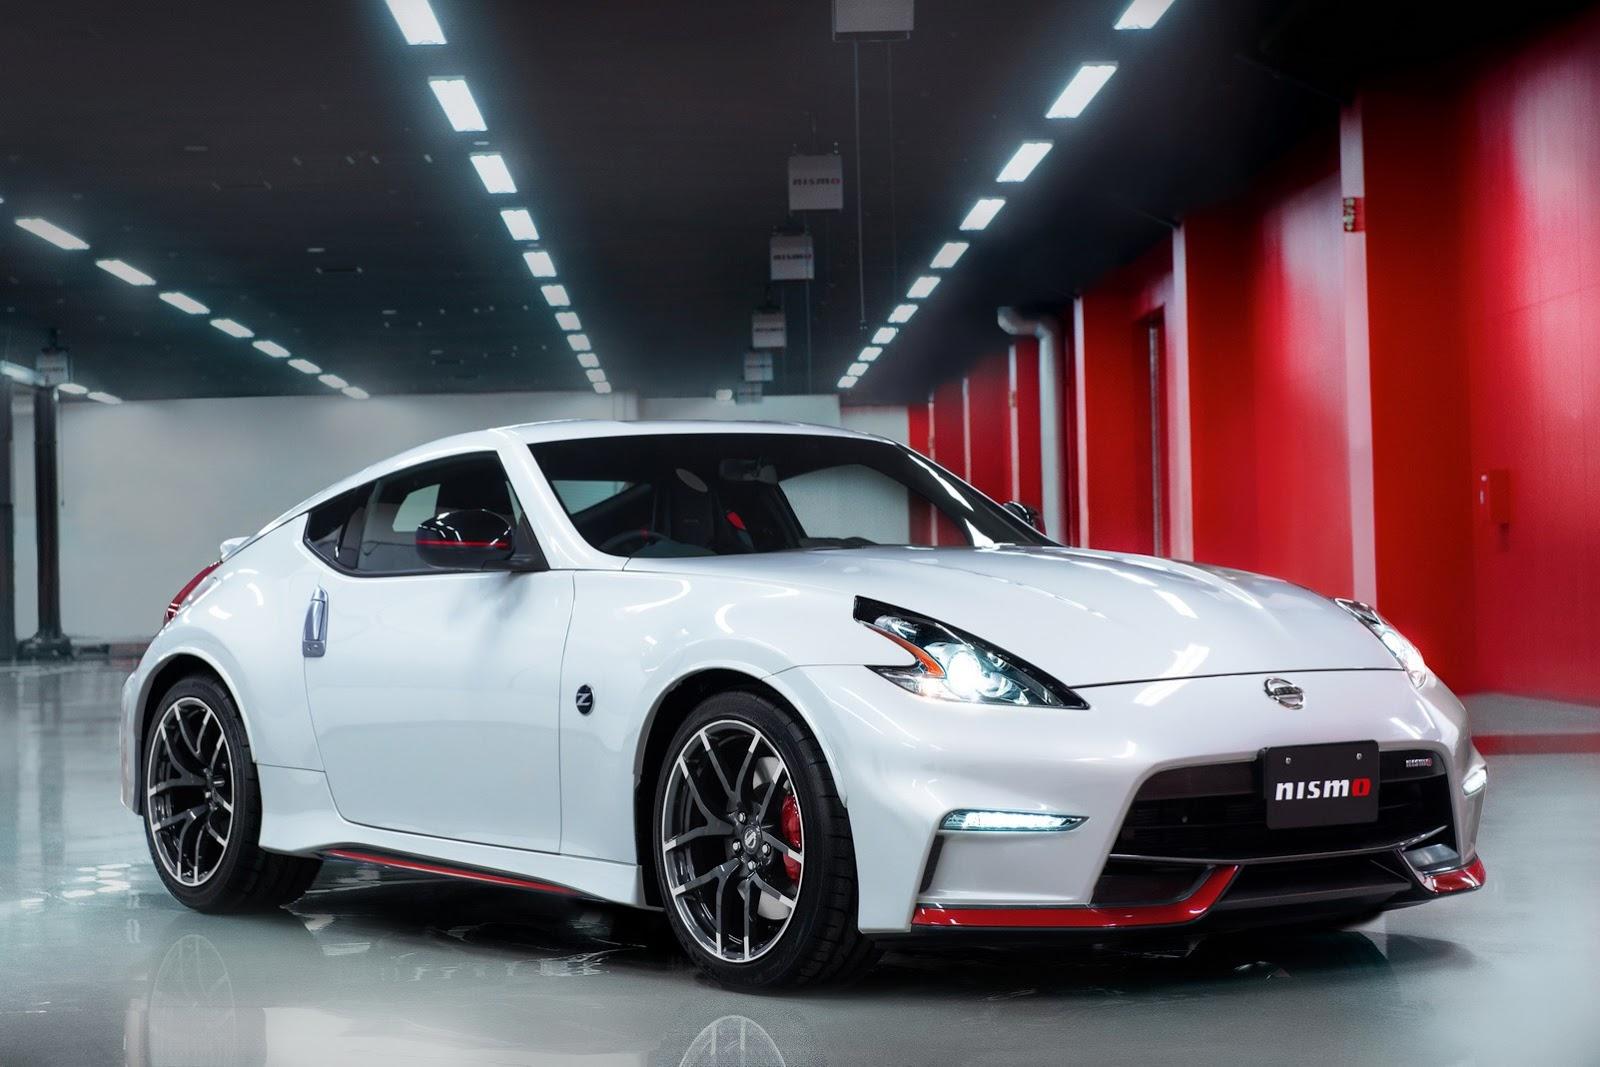 Next Generation Nissan Z To Be Turbo Hybrid